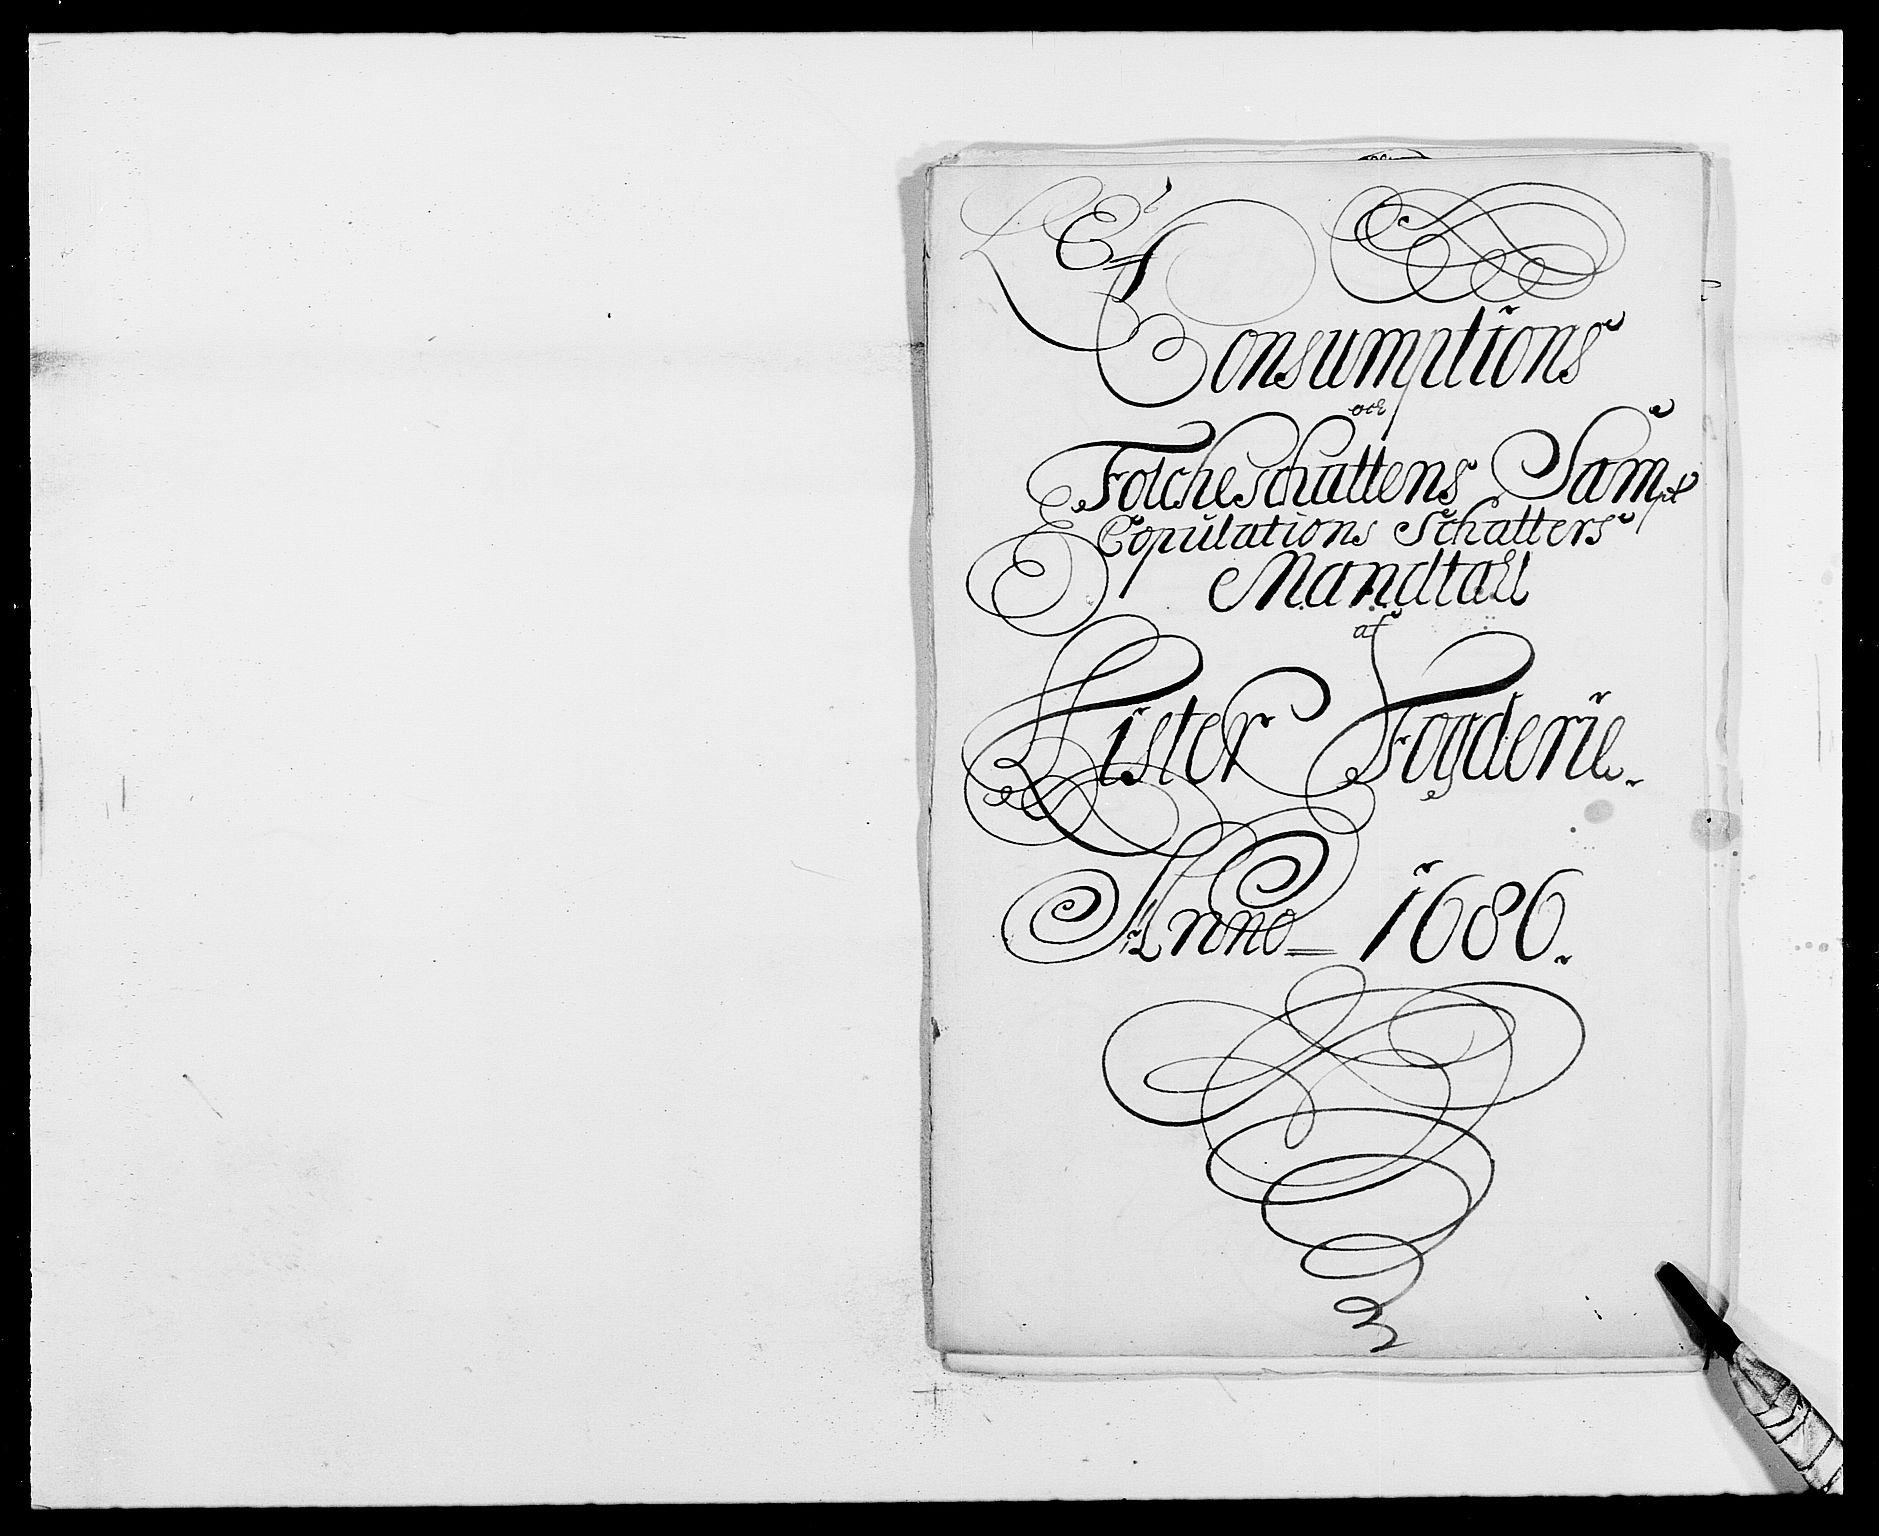 RA, Rentekammeret inntil 1814, Reviderte regnskaper, Fogderegnskap, R41/L2534: Fogderegnskap Lista, 1686-1688, s. 69